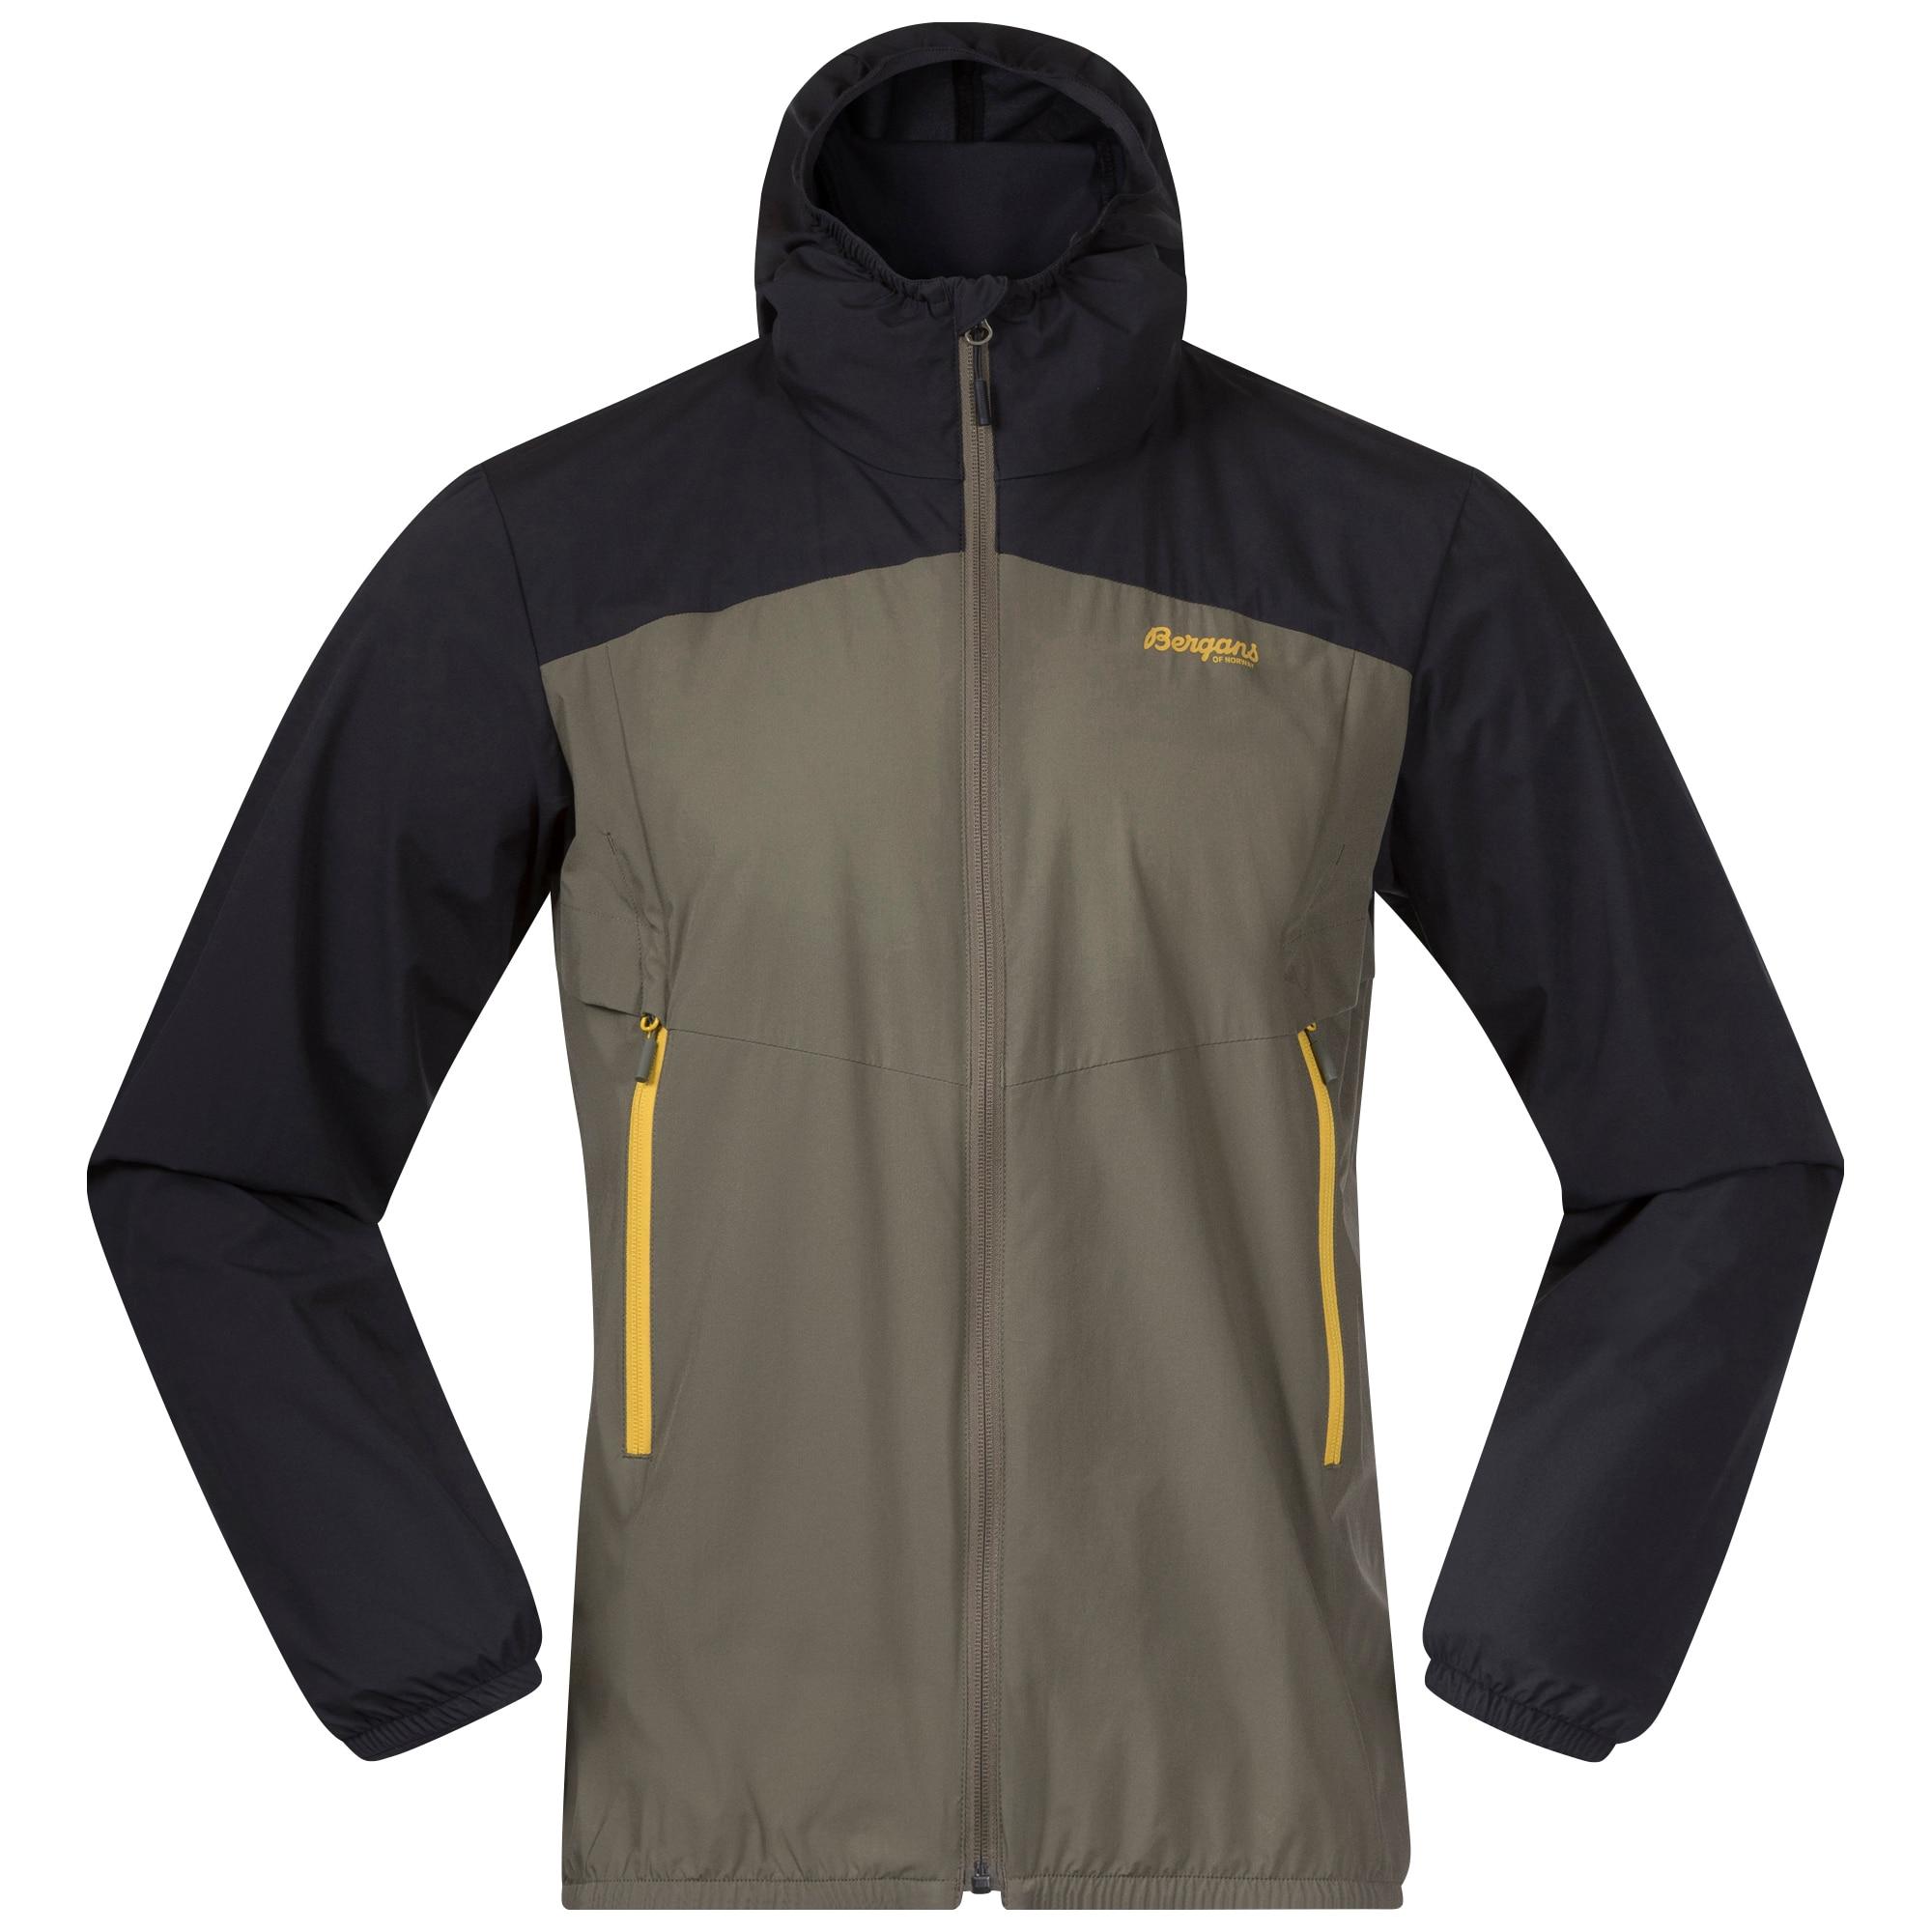 Romsdal Microlight Jacket